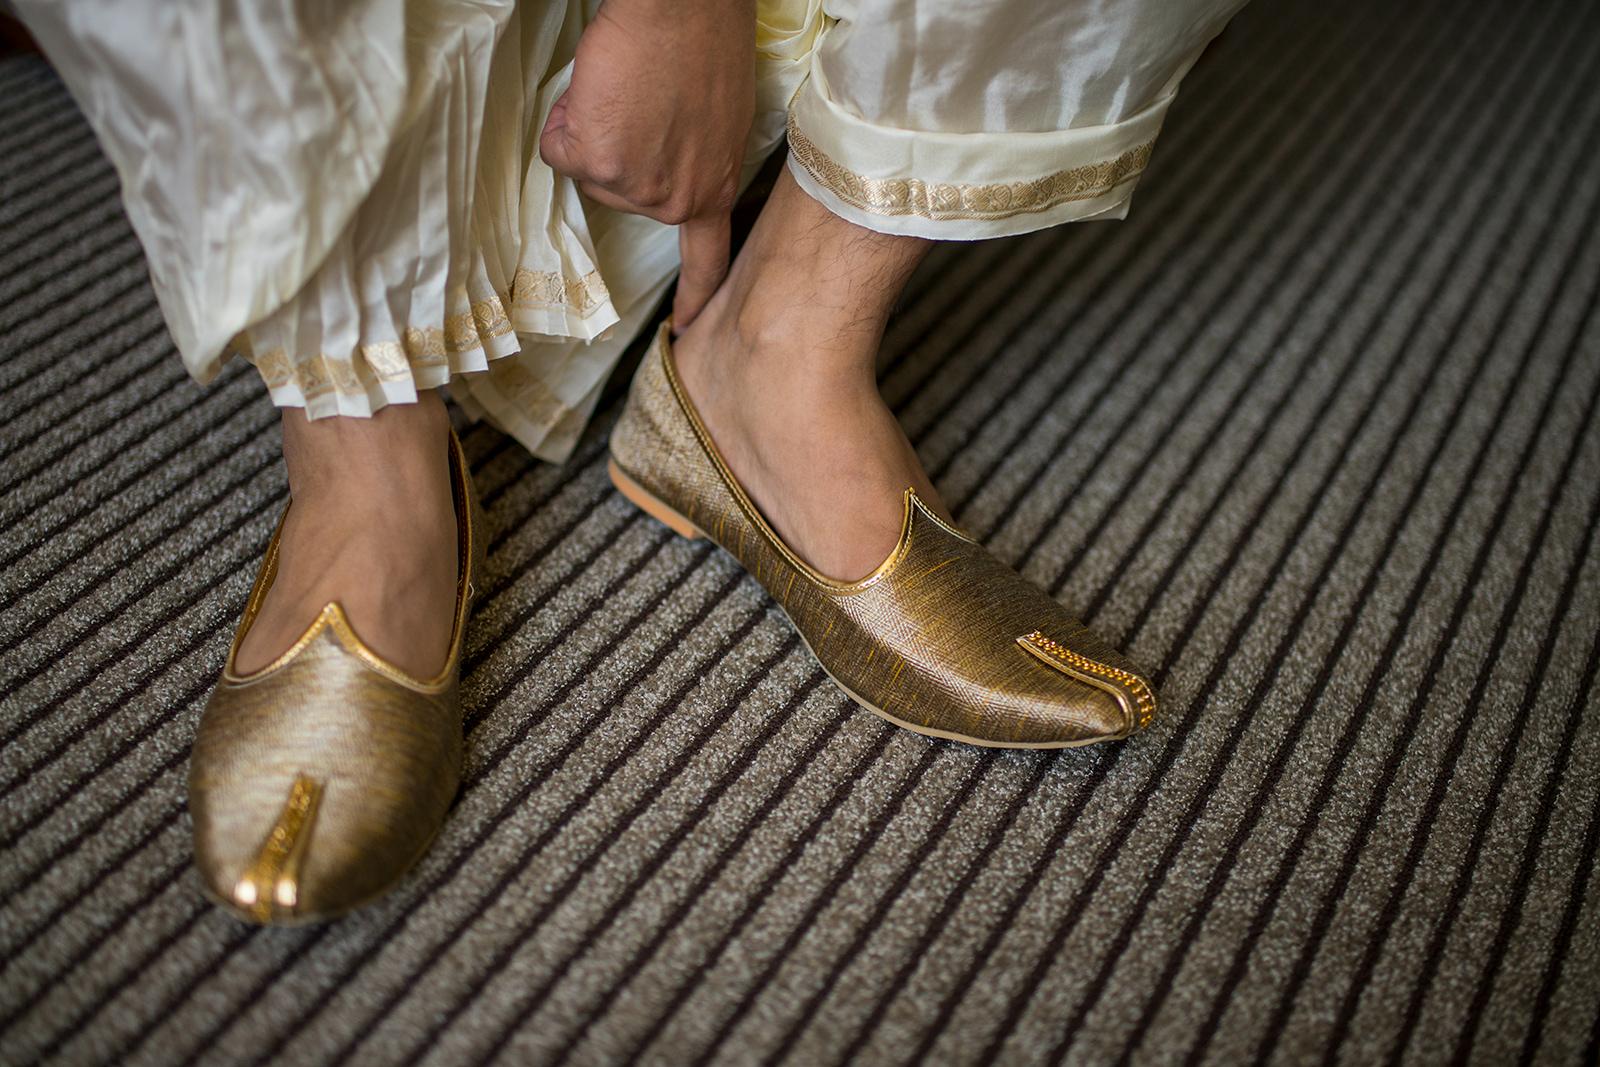 Le Cape Weddings - South Asian Wedding - Ishani and Sidhart - Groom-10.jpg